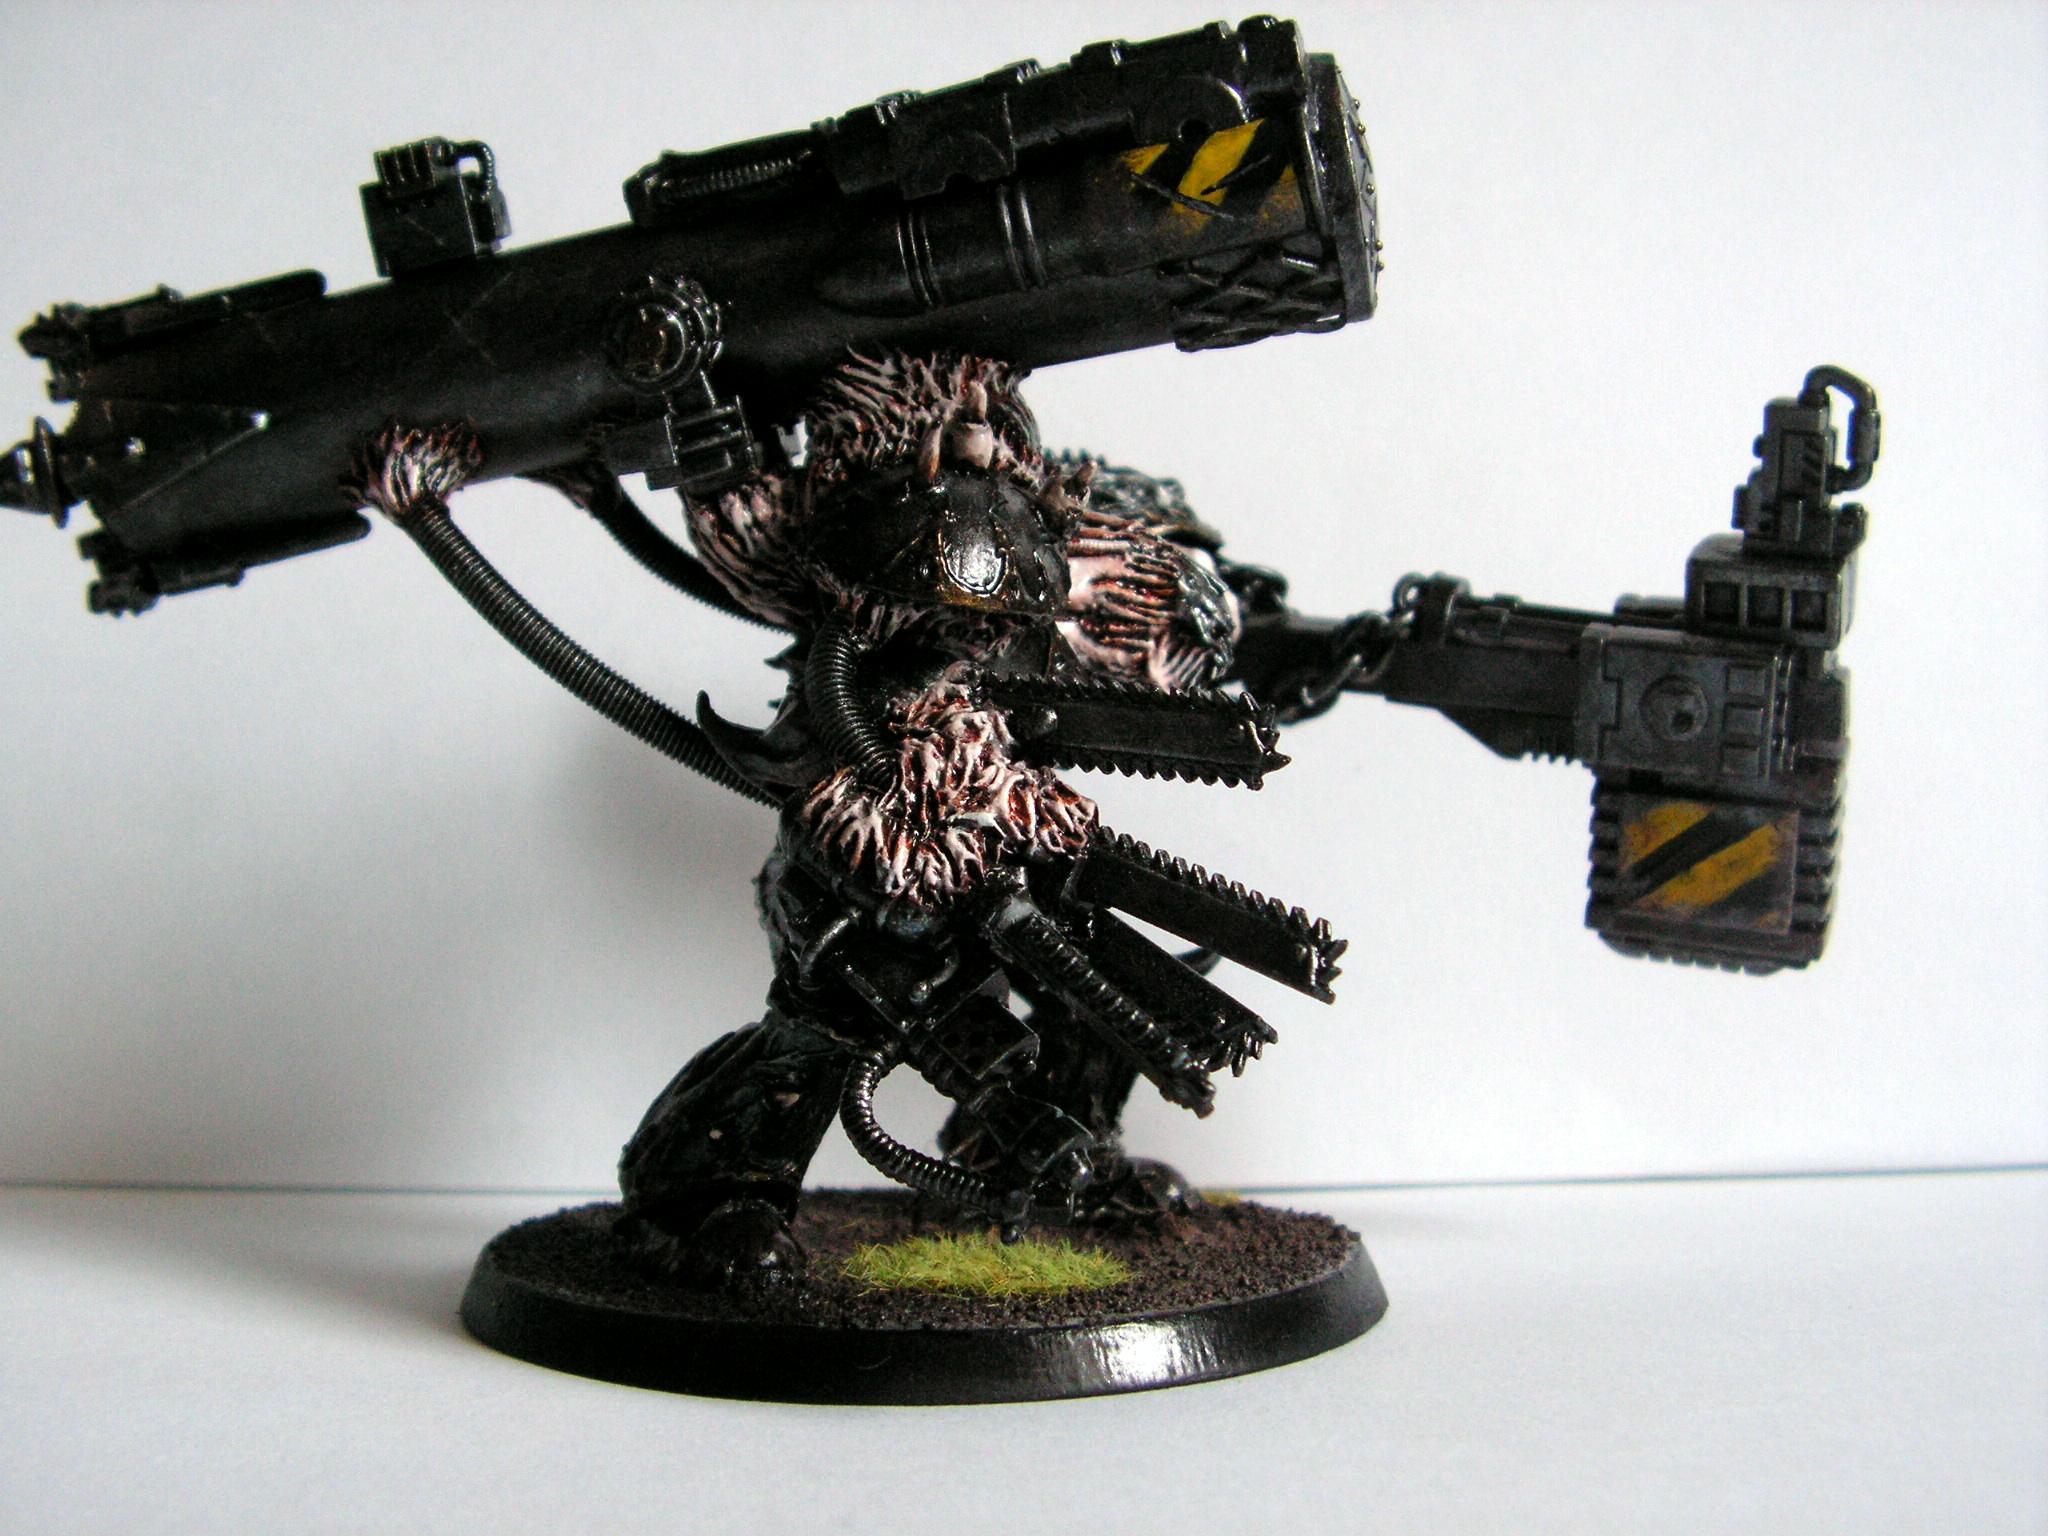 Chaos Space Marines, Daemon Prince, Daemon Prince Iron Warriors, Daemons, Iron Warriors, Prince, Warhammer 40,000